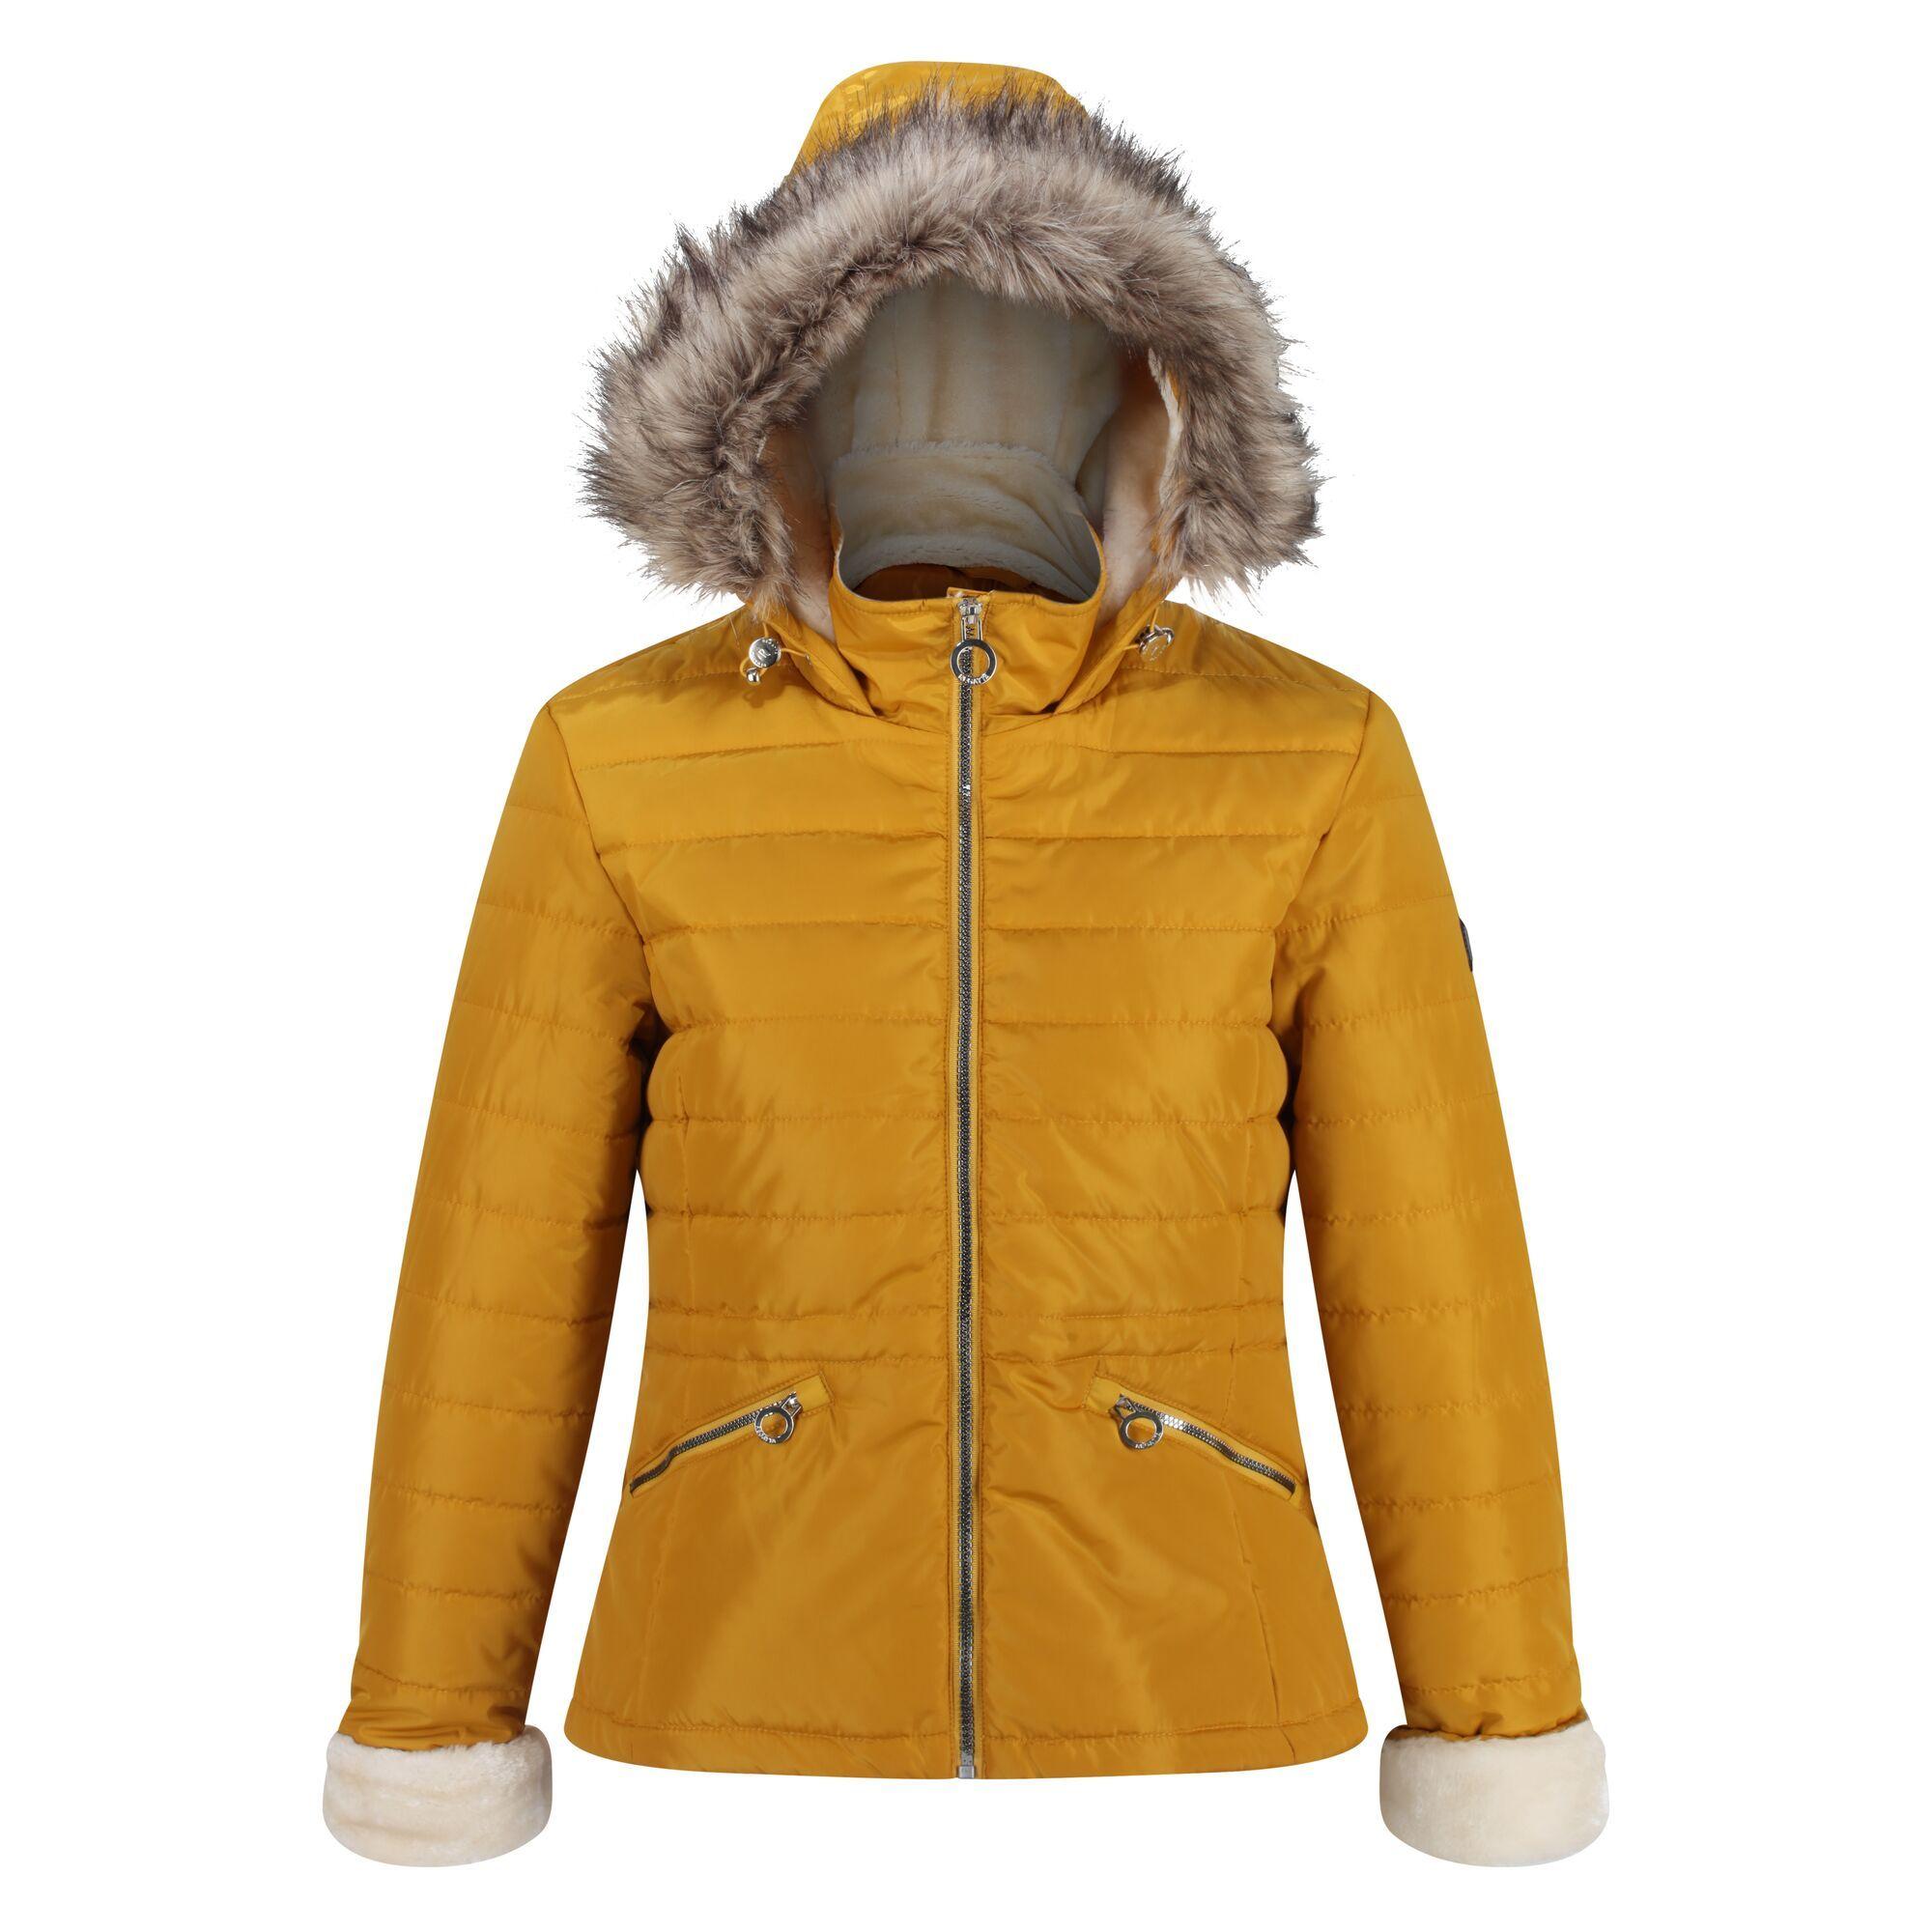 Regatta Womens/Ladies Westlynn Quilted Insulated Jacket (20 UK) (Mustard Seed)